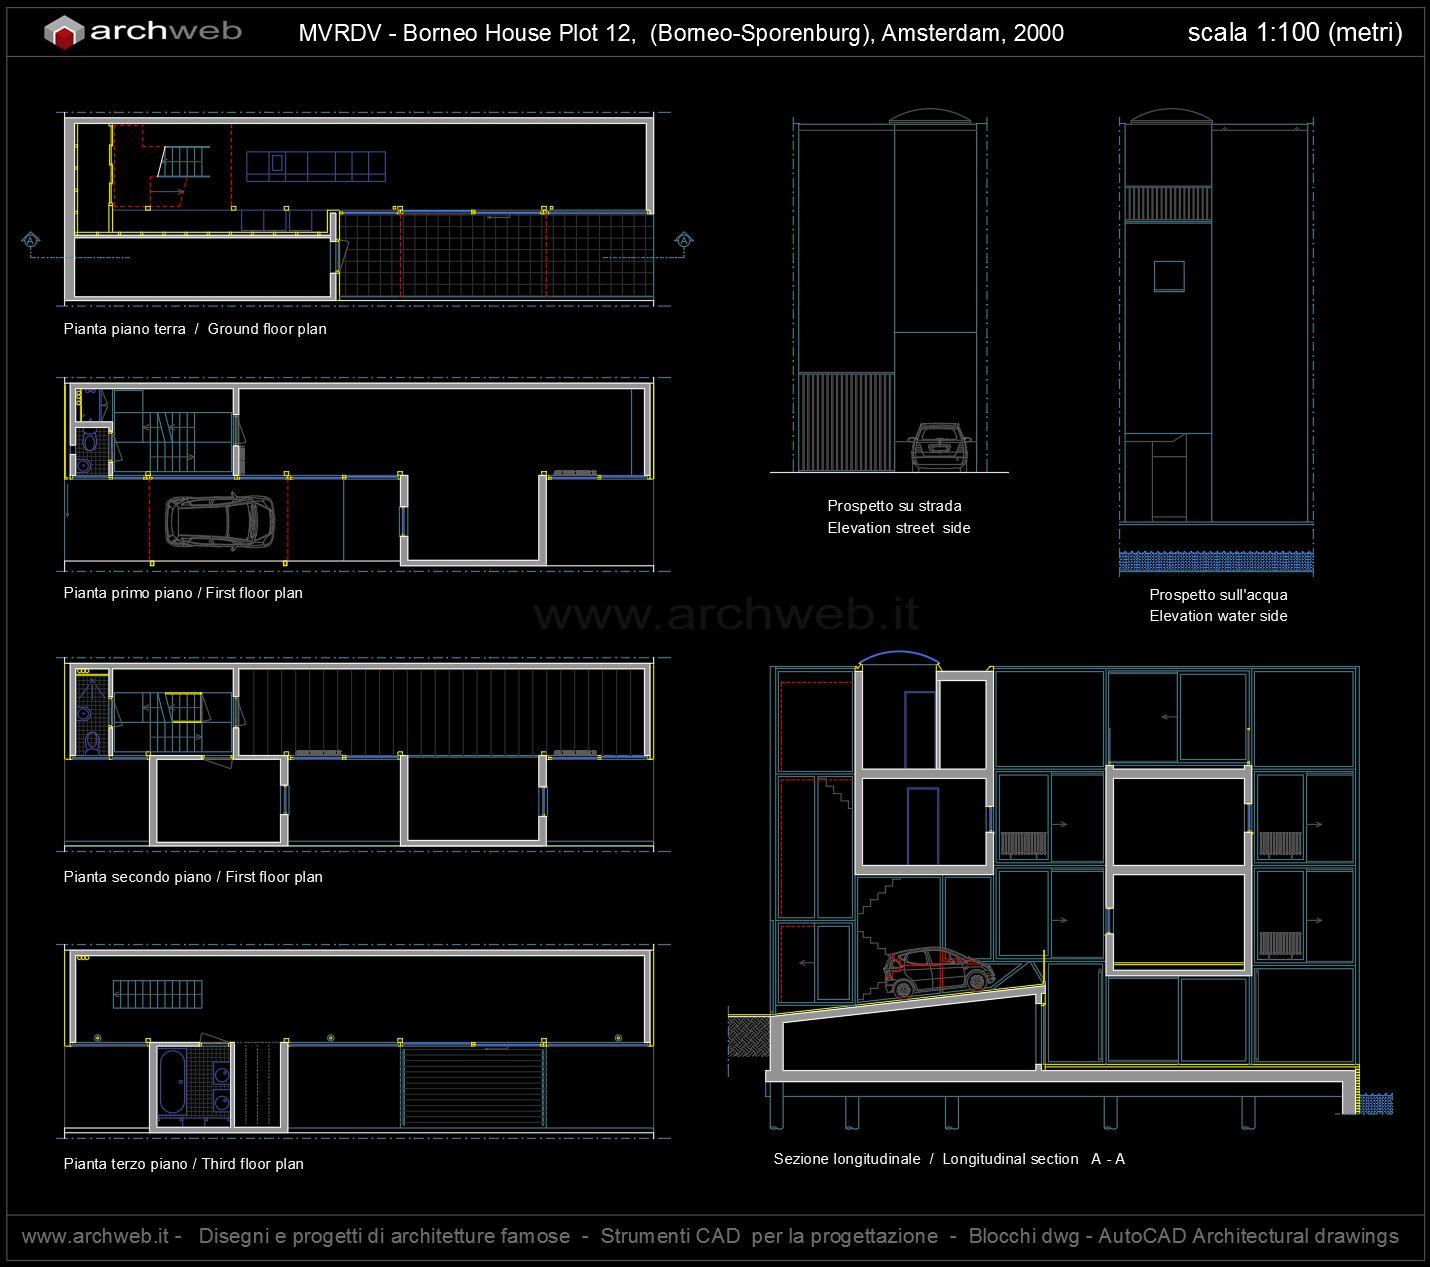 Borneo house plot 12 borneo sporenburg amsterdam 1999 for Porte archweb